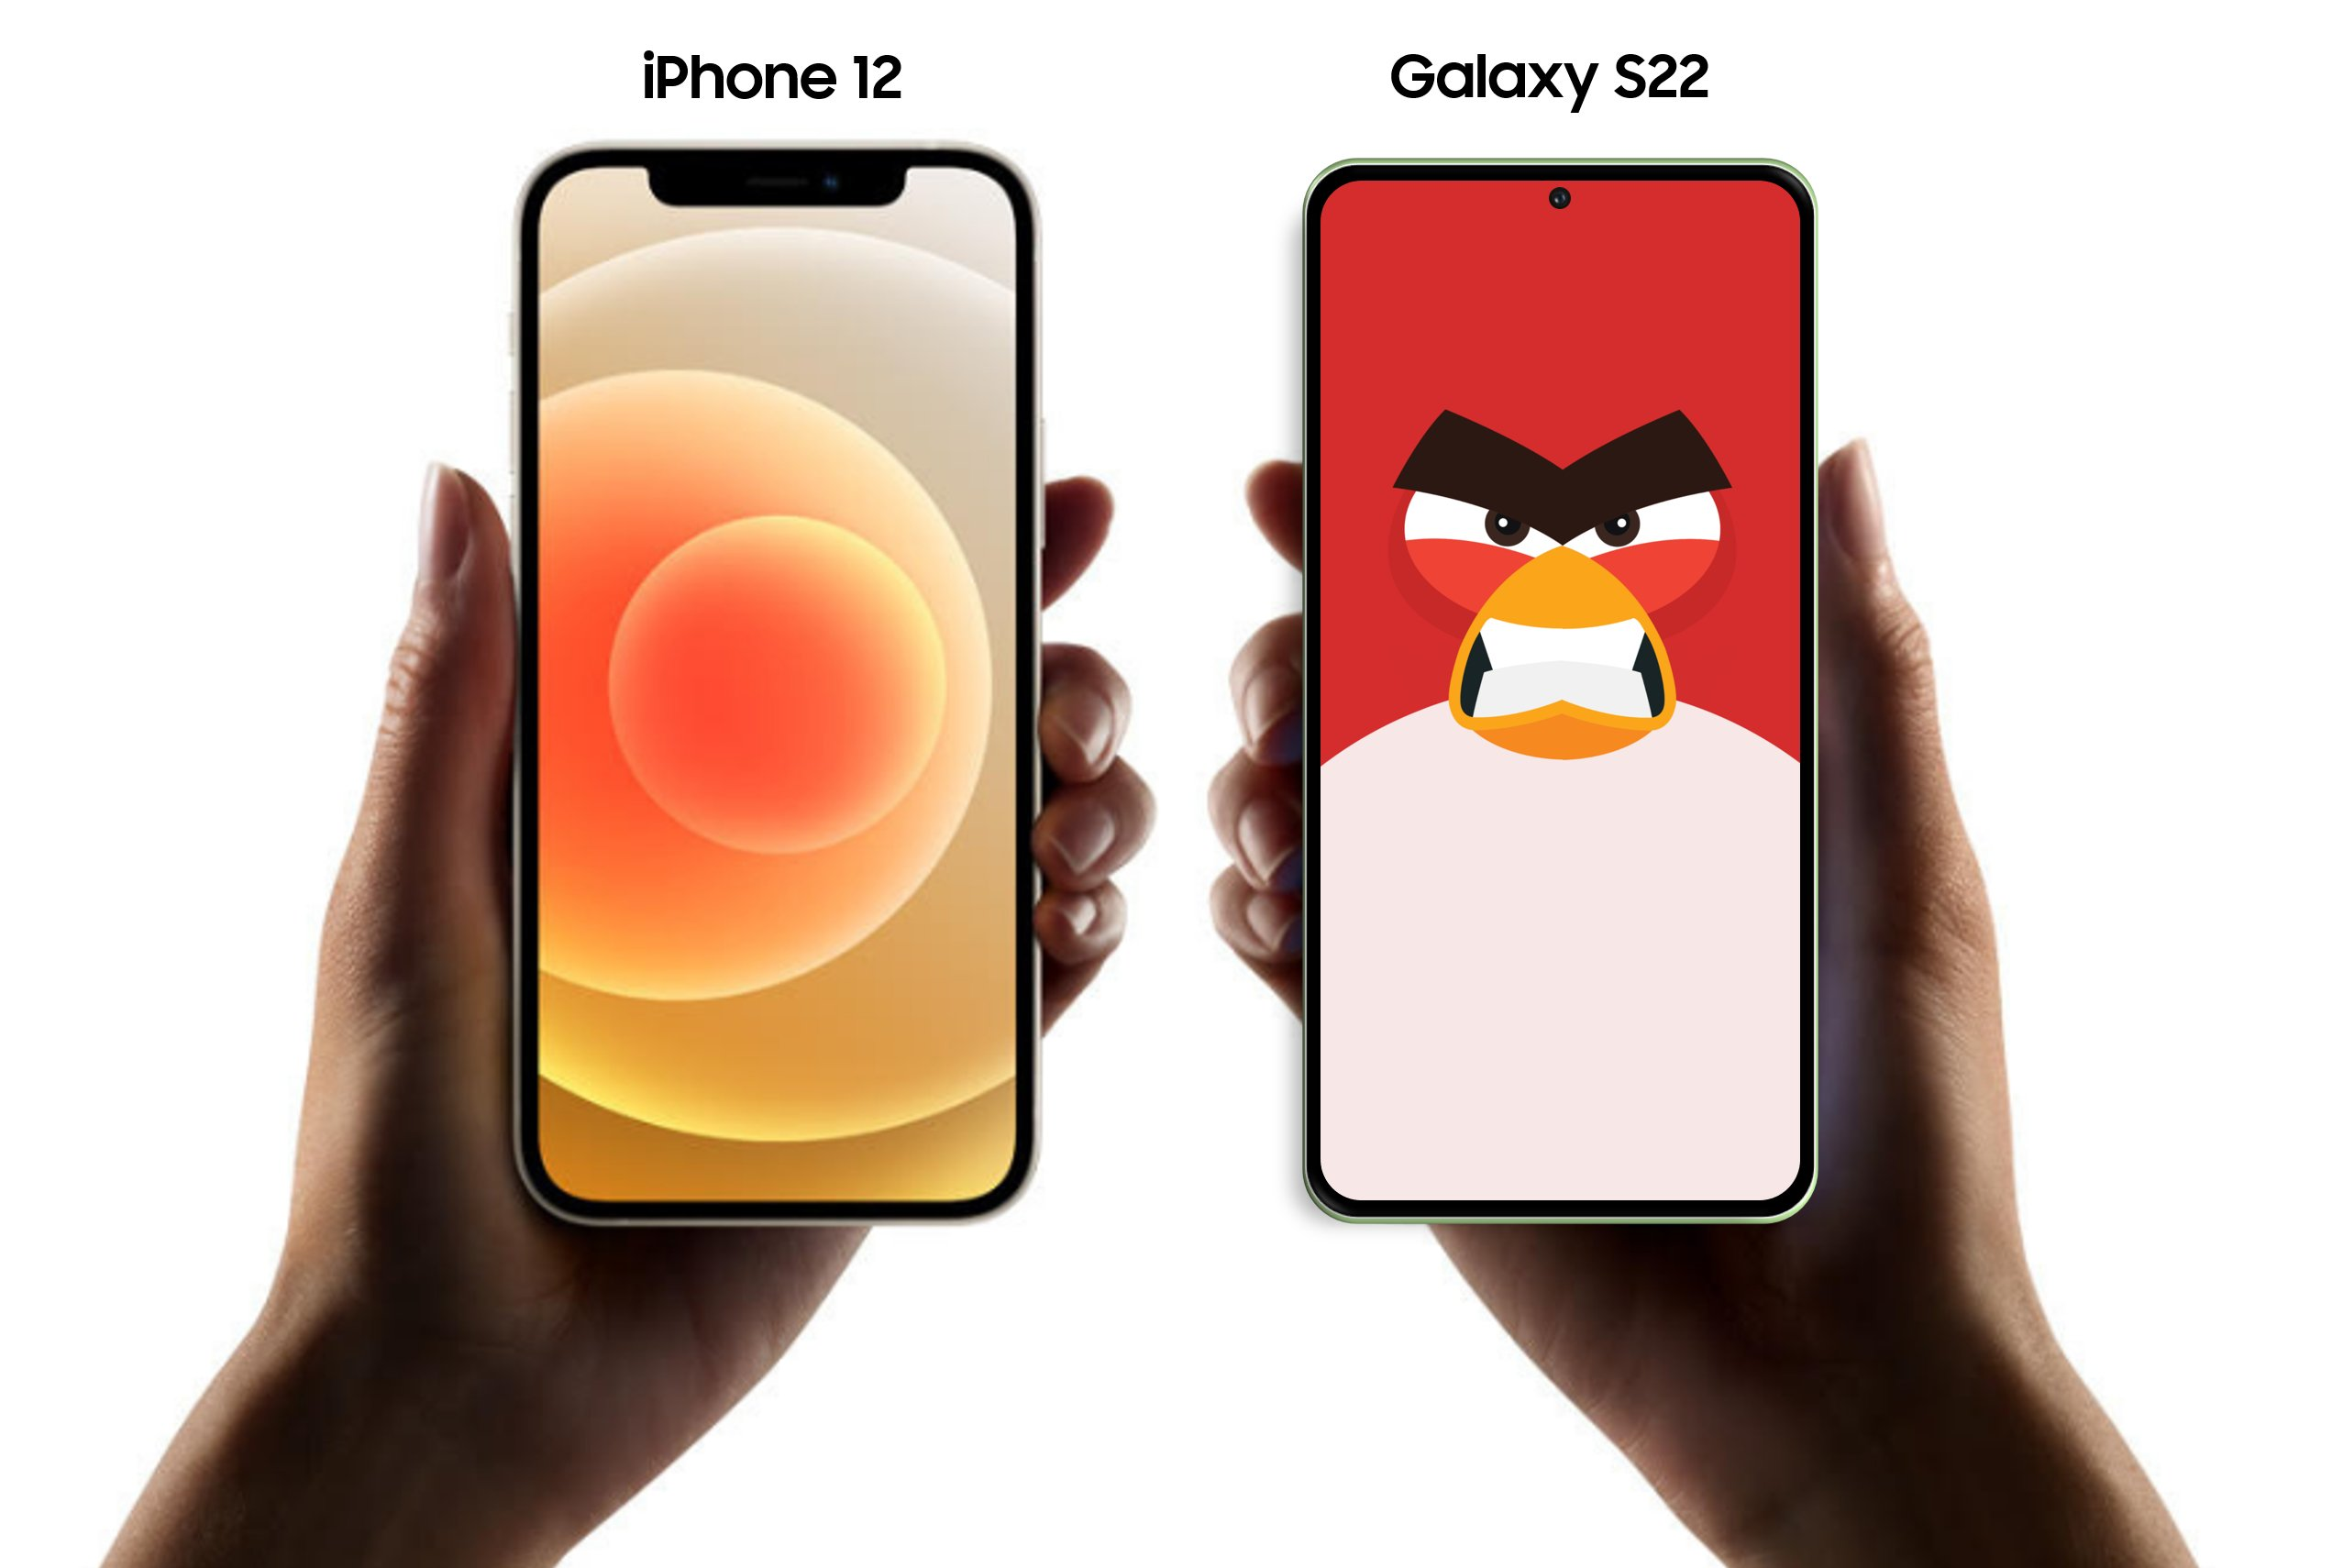 Galaxy S22 vs iPhone 12